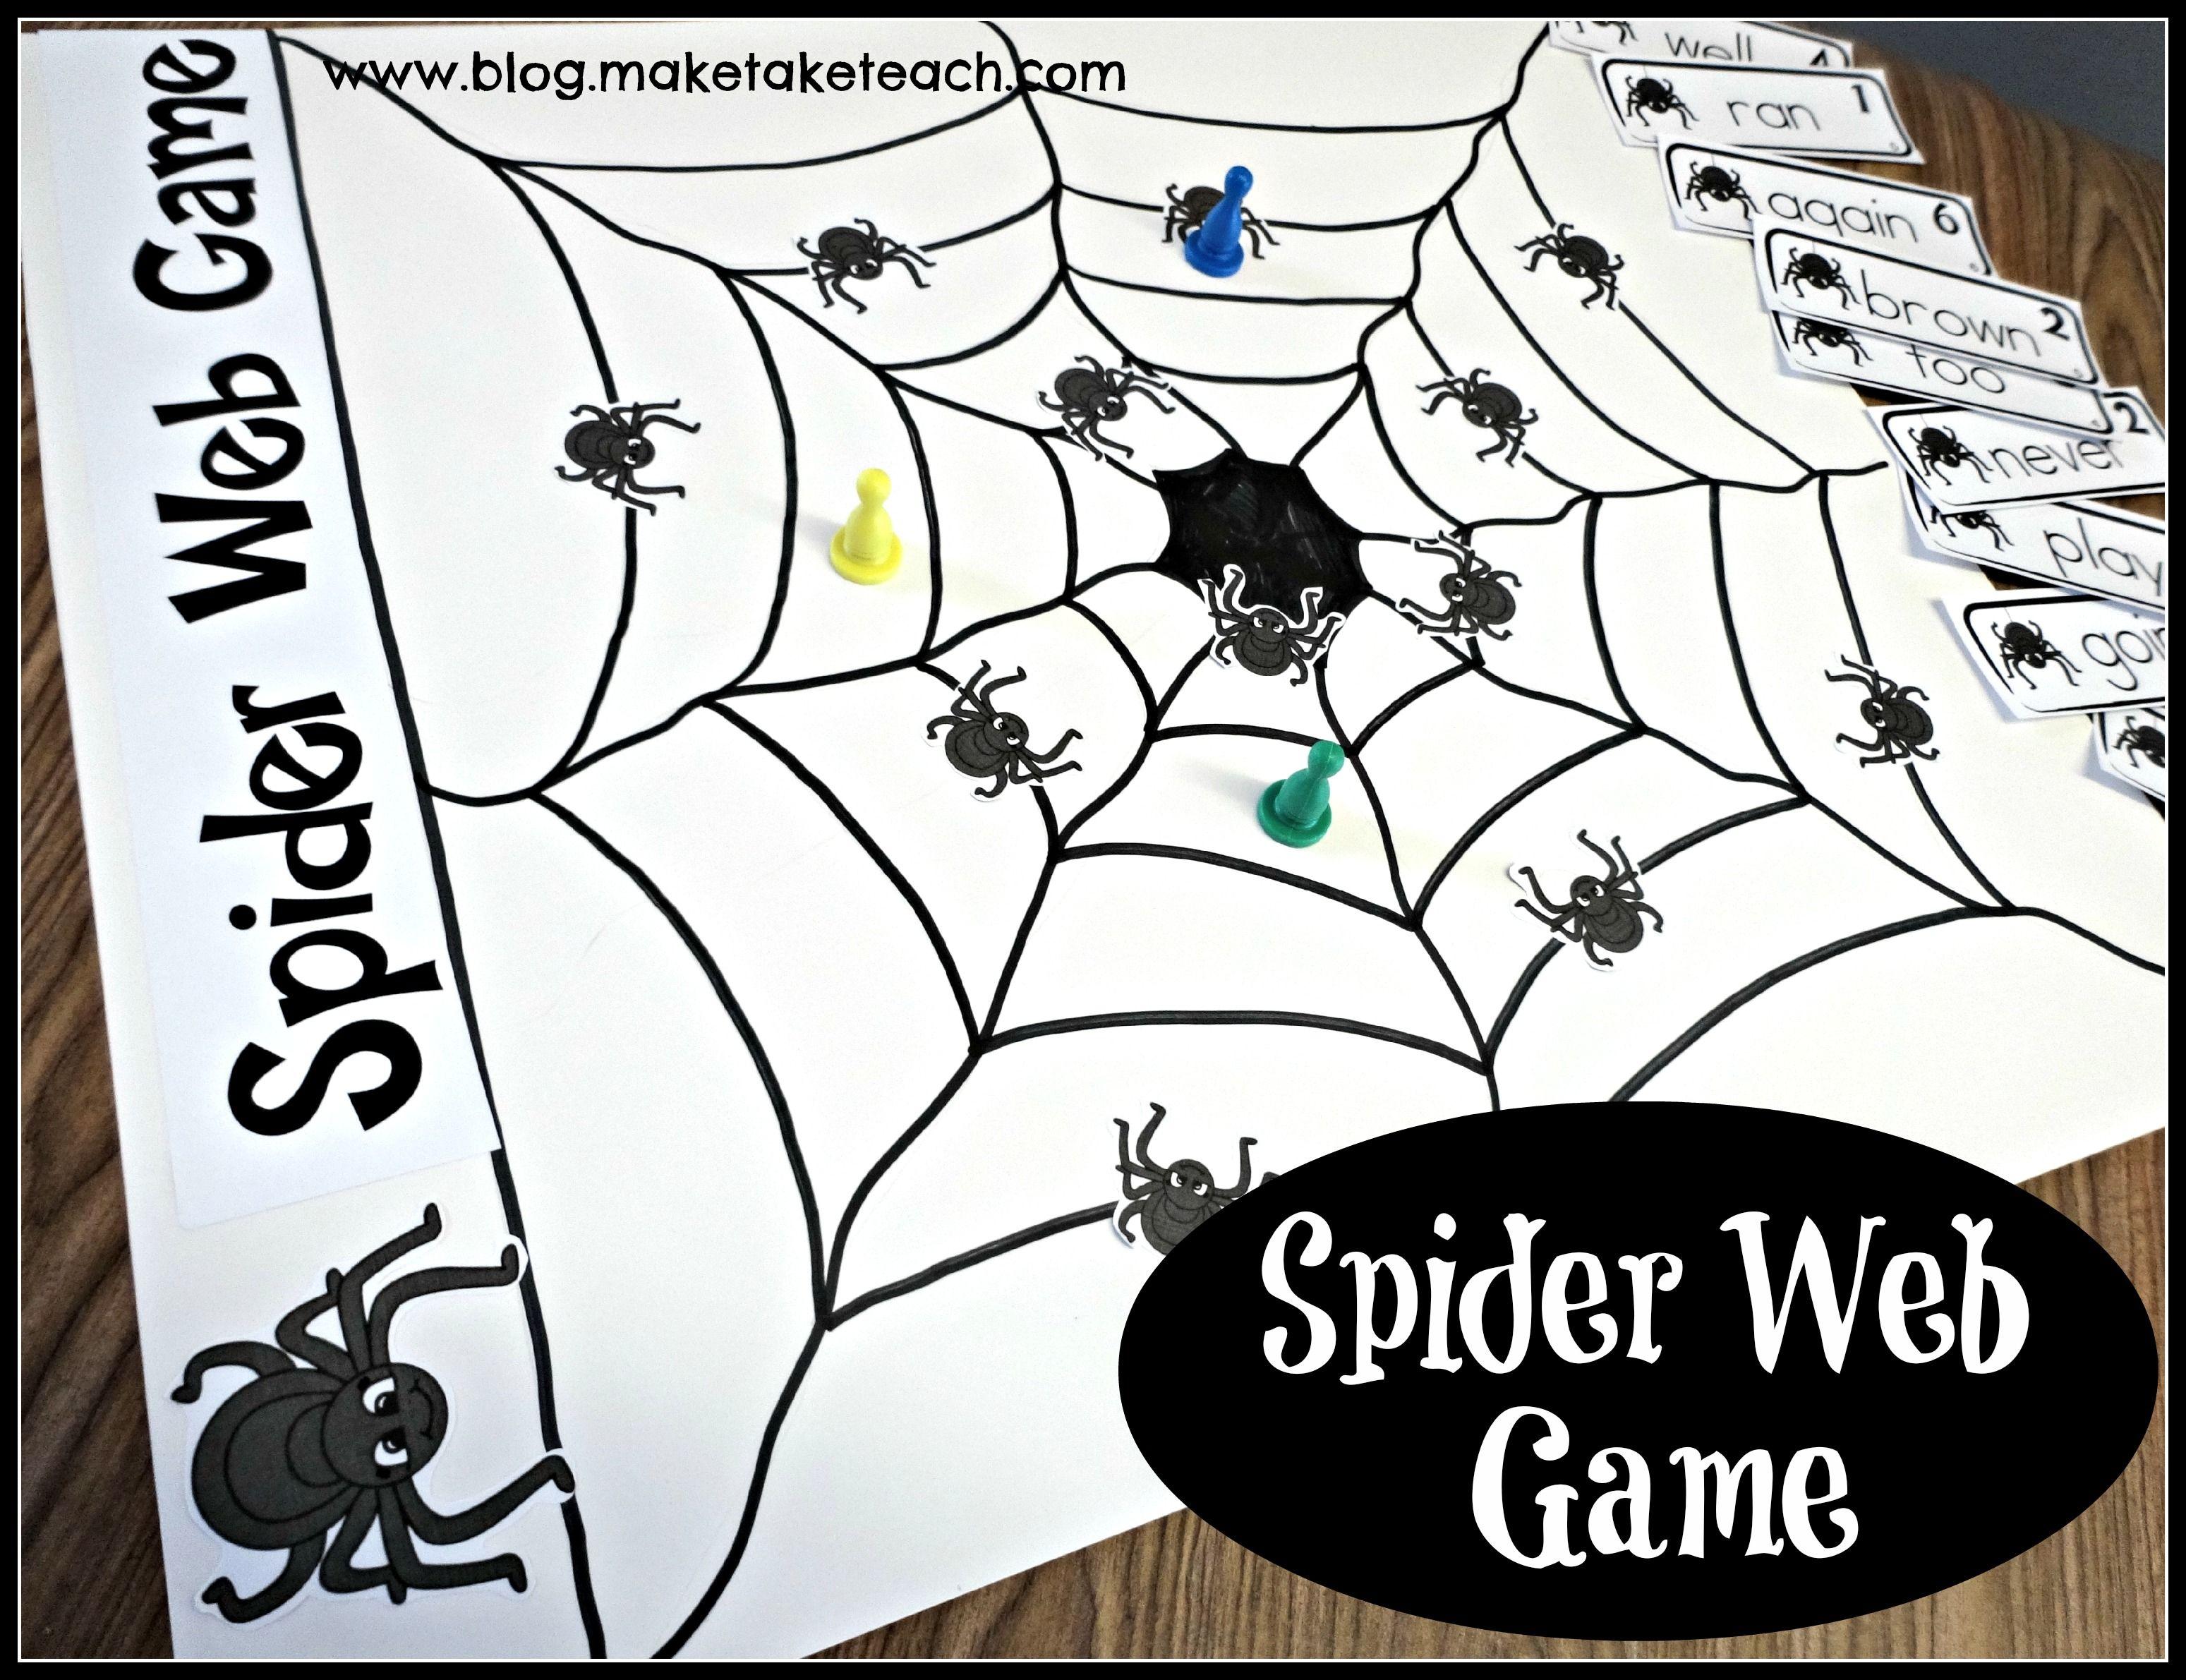 Spider Web Game